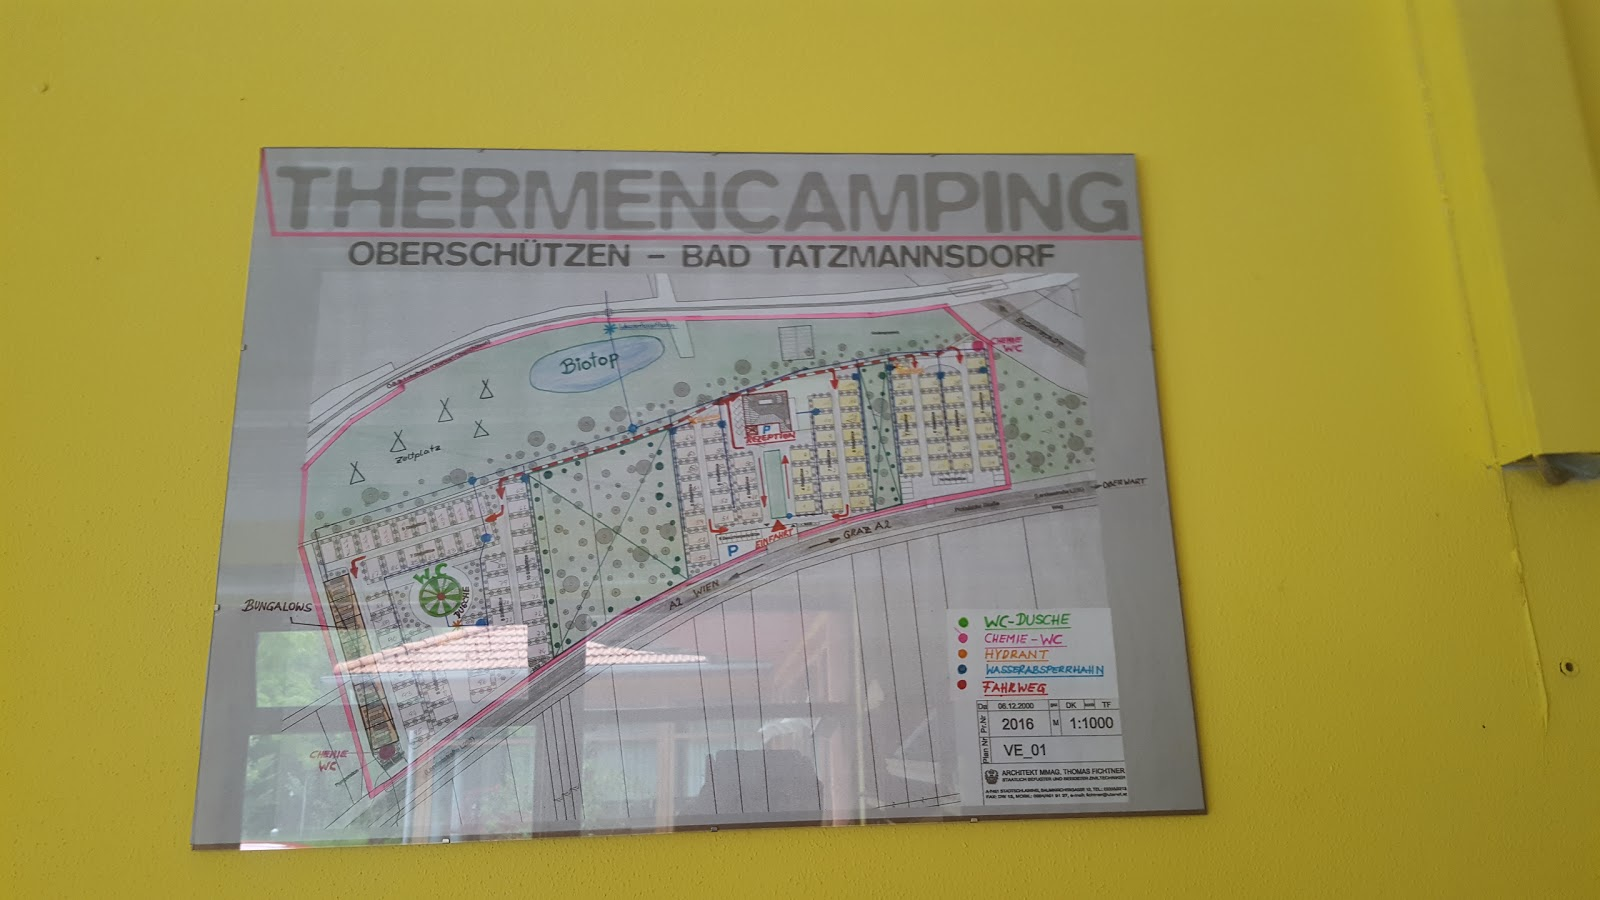 Thermencamping obersch tzen bad tatzmannsdorf tripcarta - Spiegel bad tatzmannsdorf ...